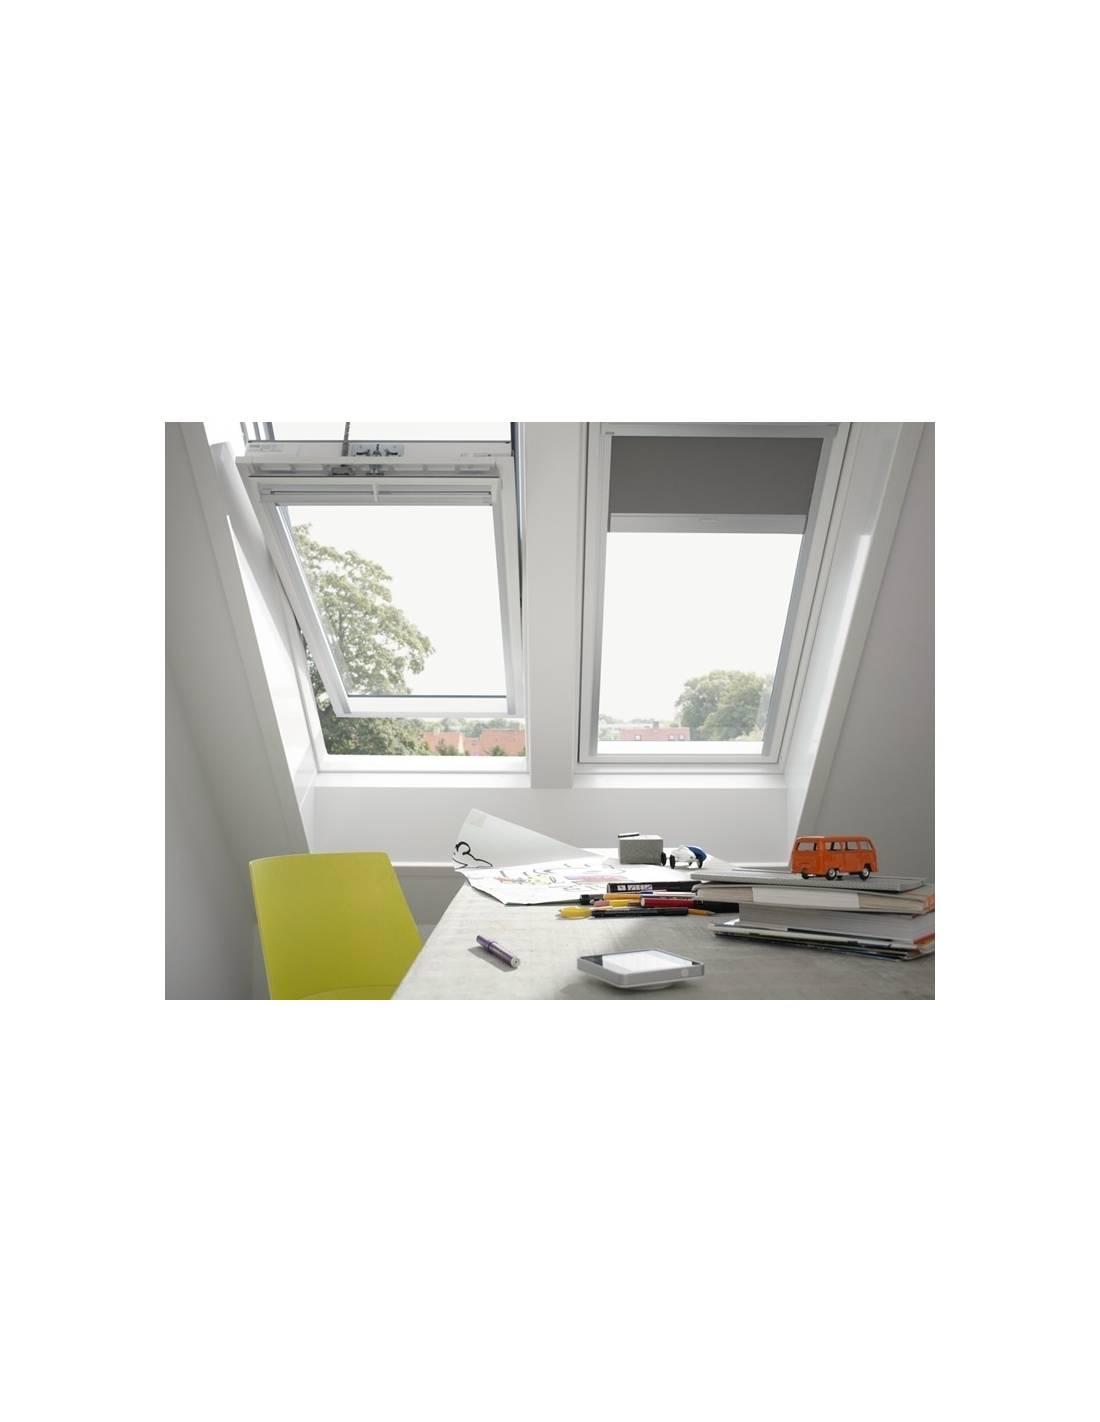 Velux ggl integra elettrica finestra a bilico elettrica for Finestre velux ggl